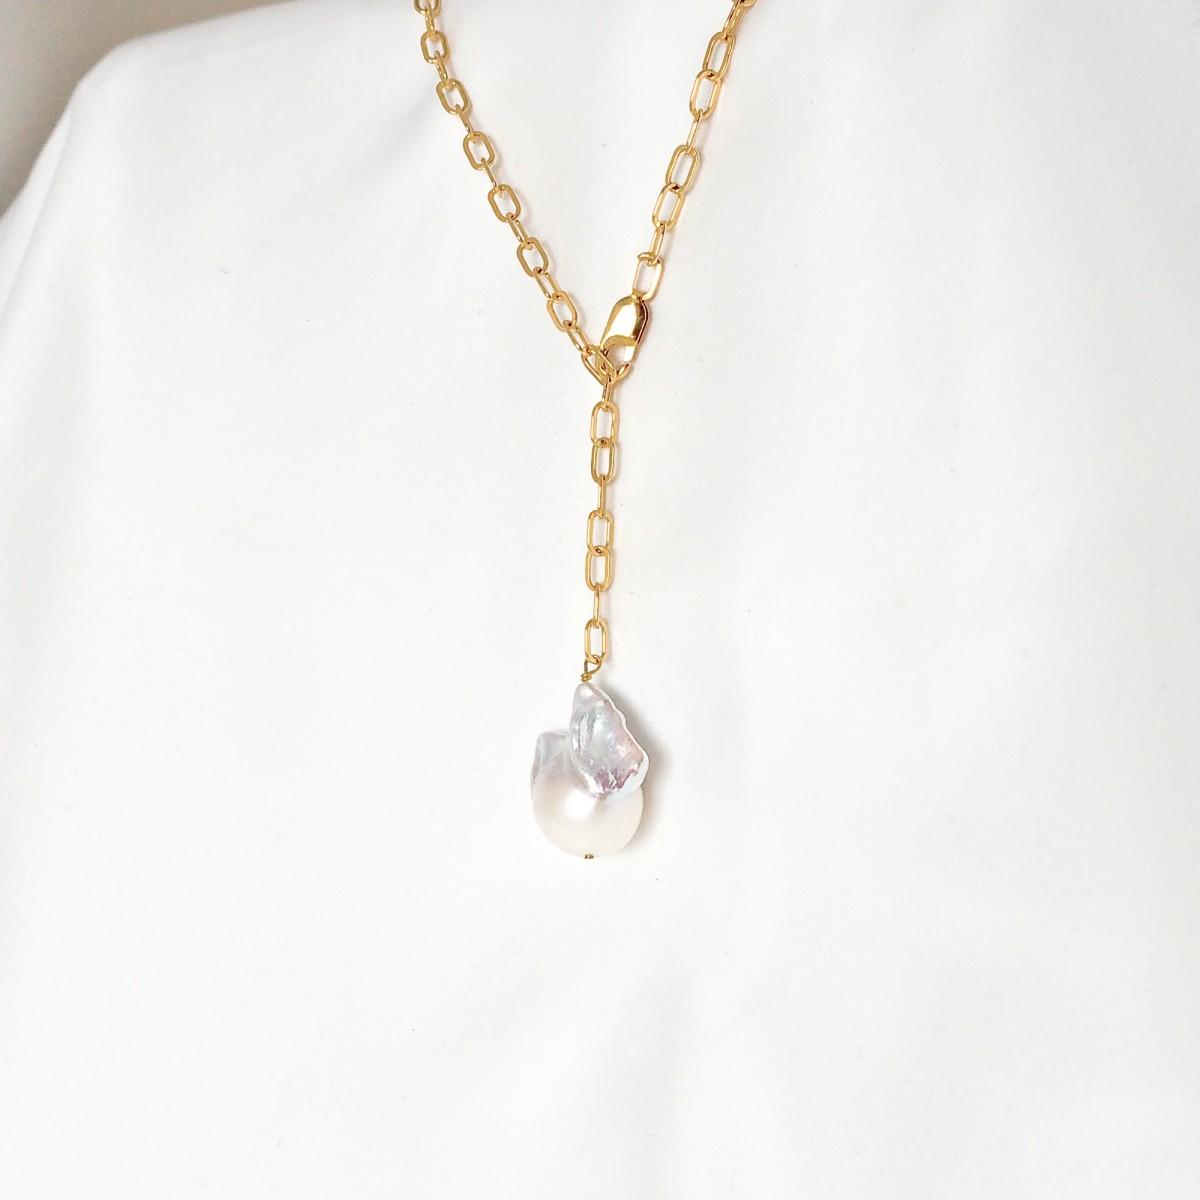 ST'ATOUR MADITA - Kette mit Perle in Gold, Silber oder Roségold